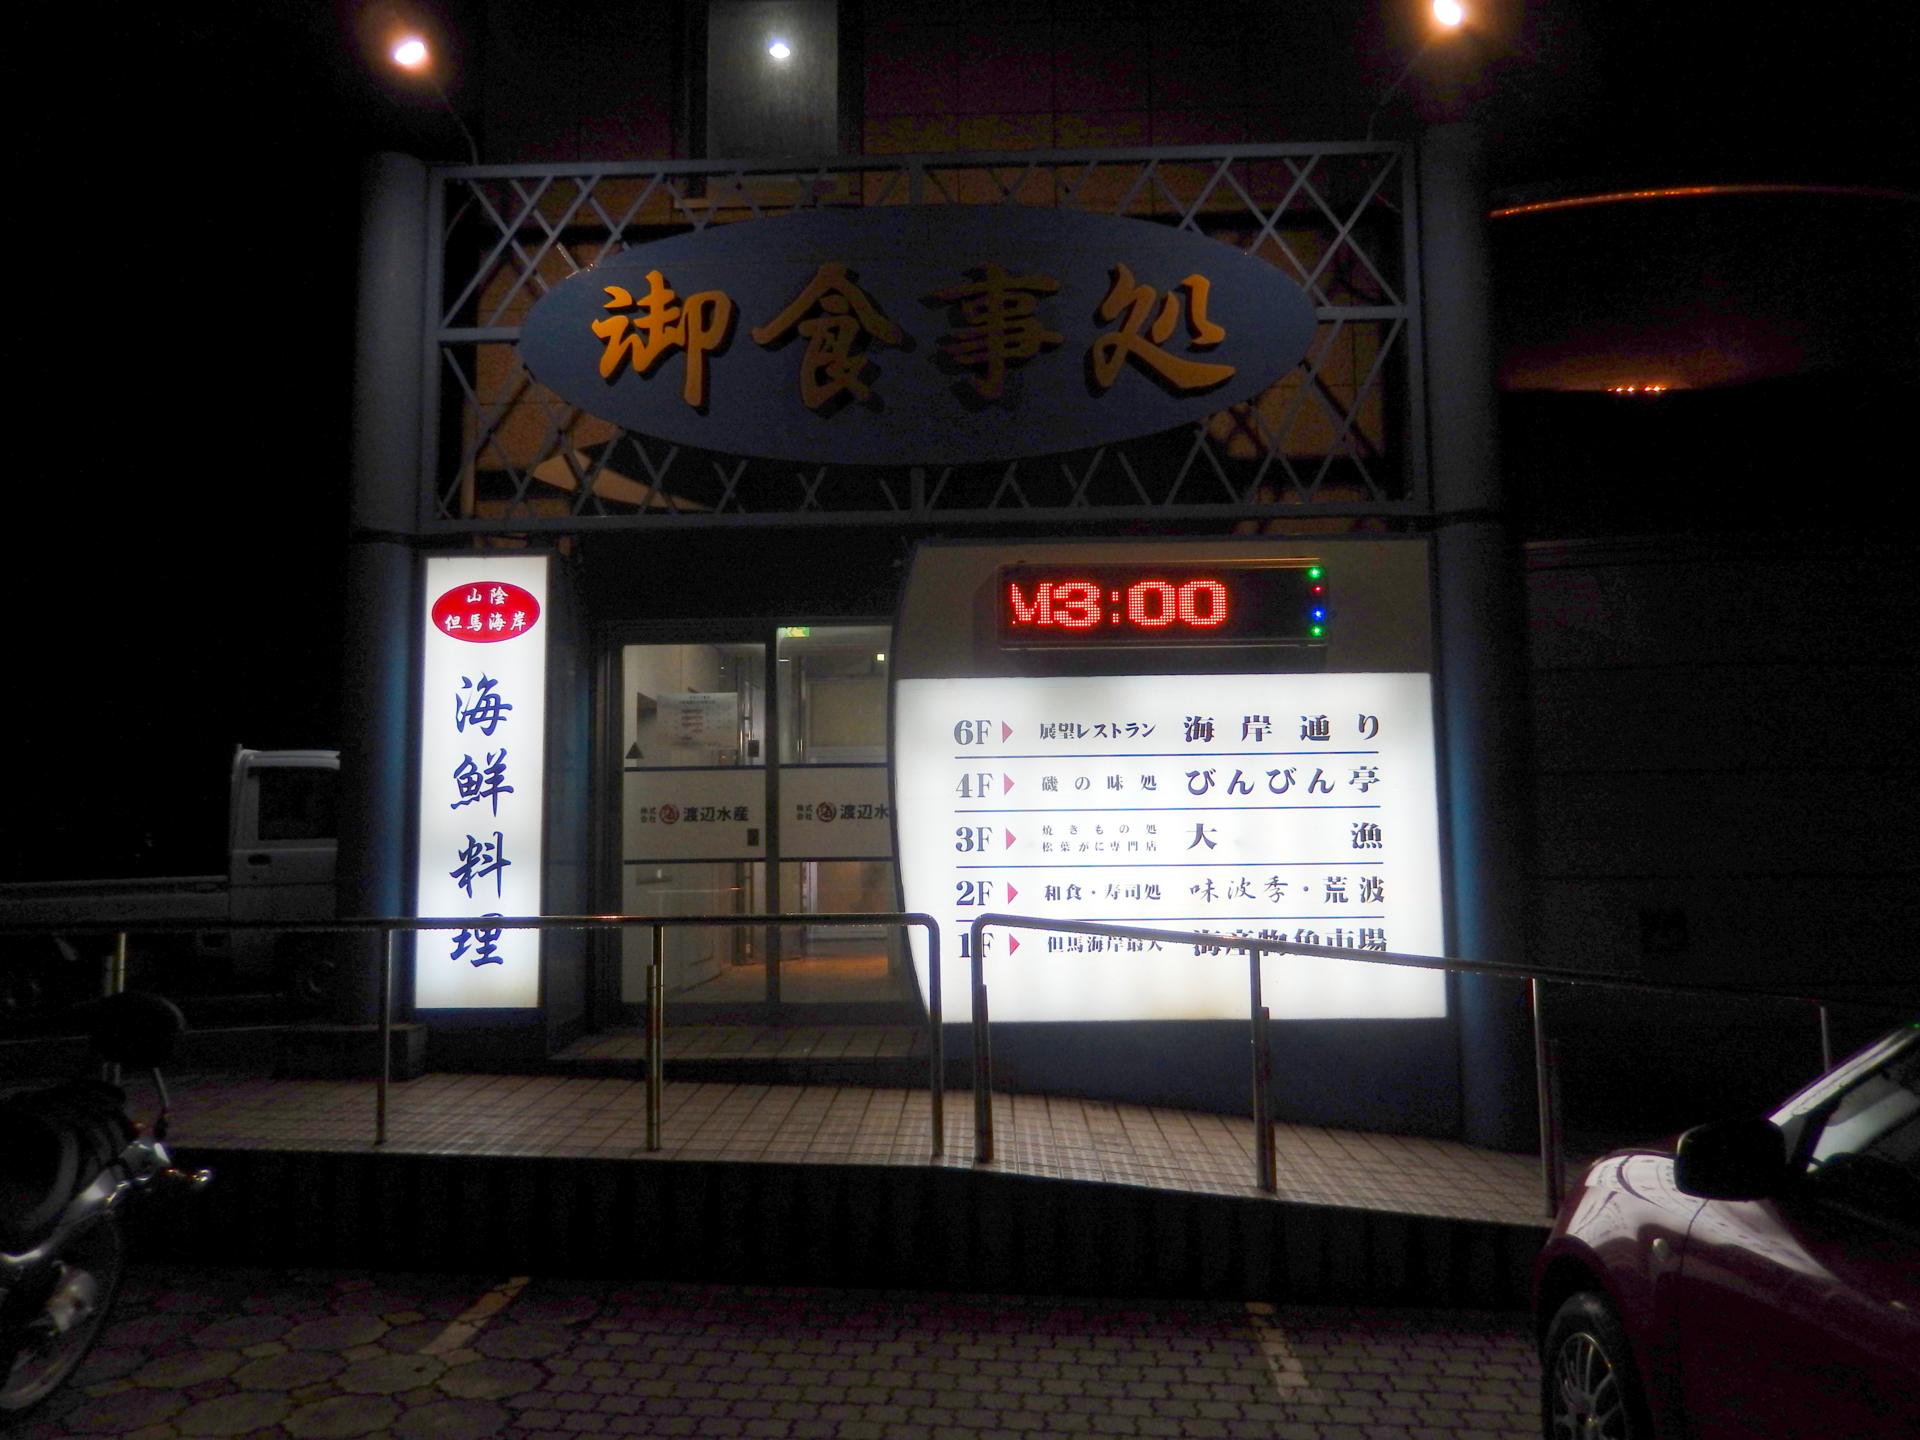 f:id:ToshUeno:20140913202108j:plain